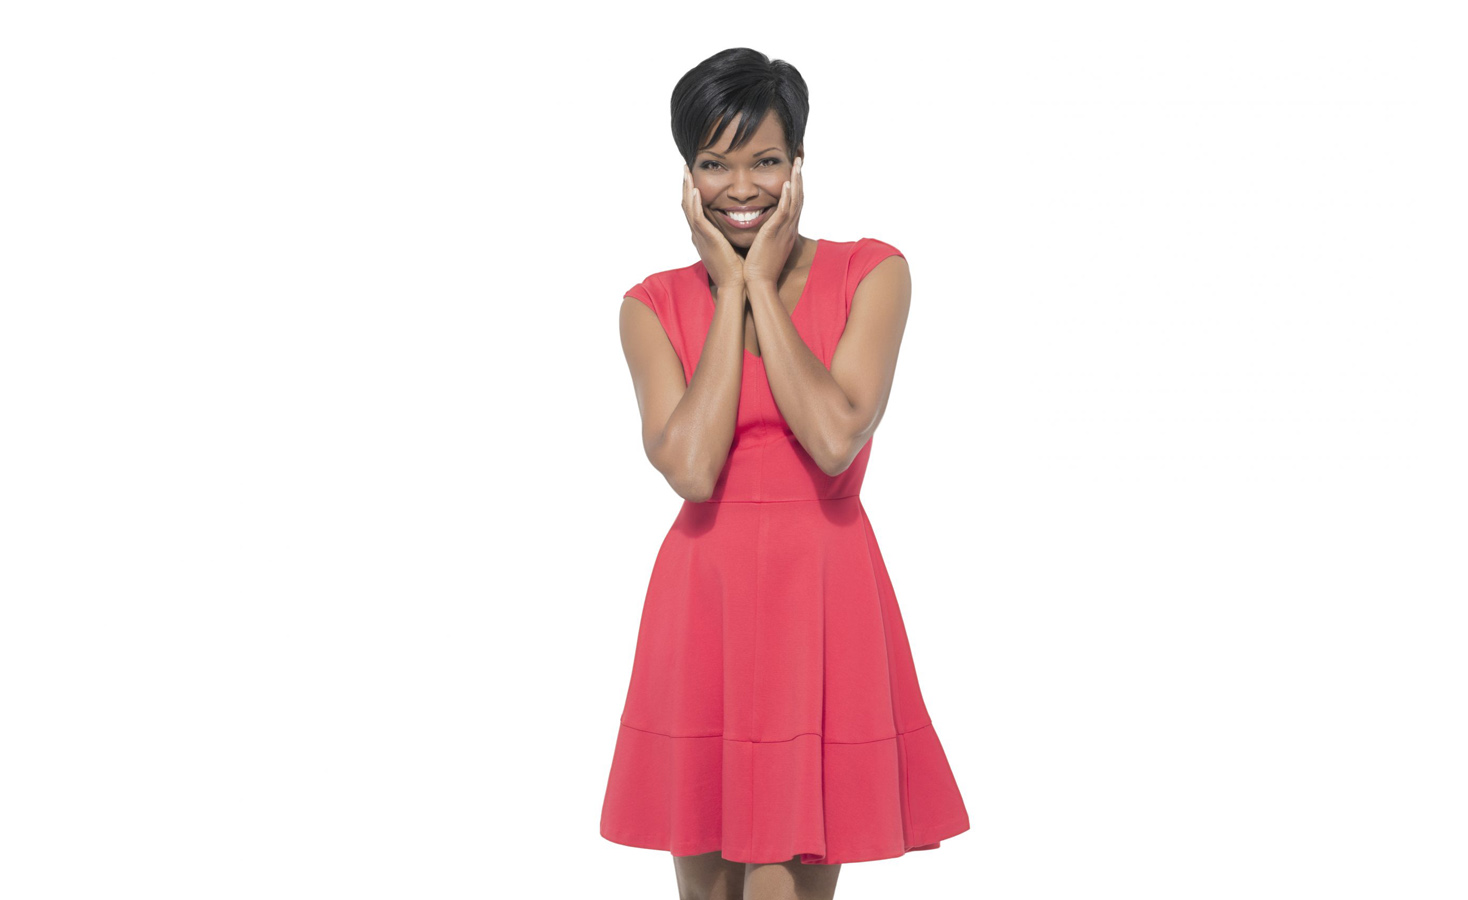 blu skin care founder zondra wilson